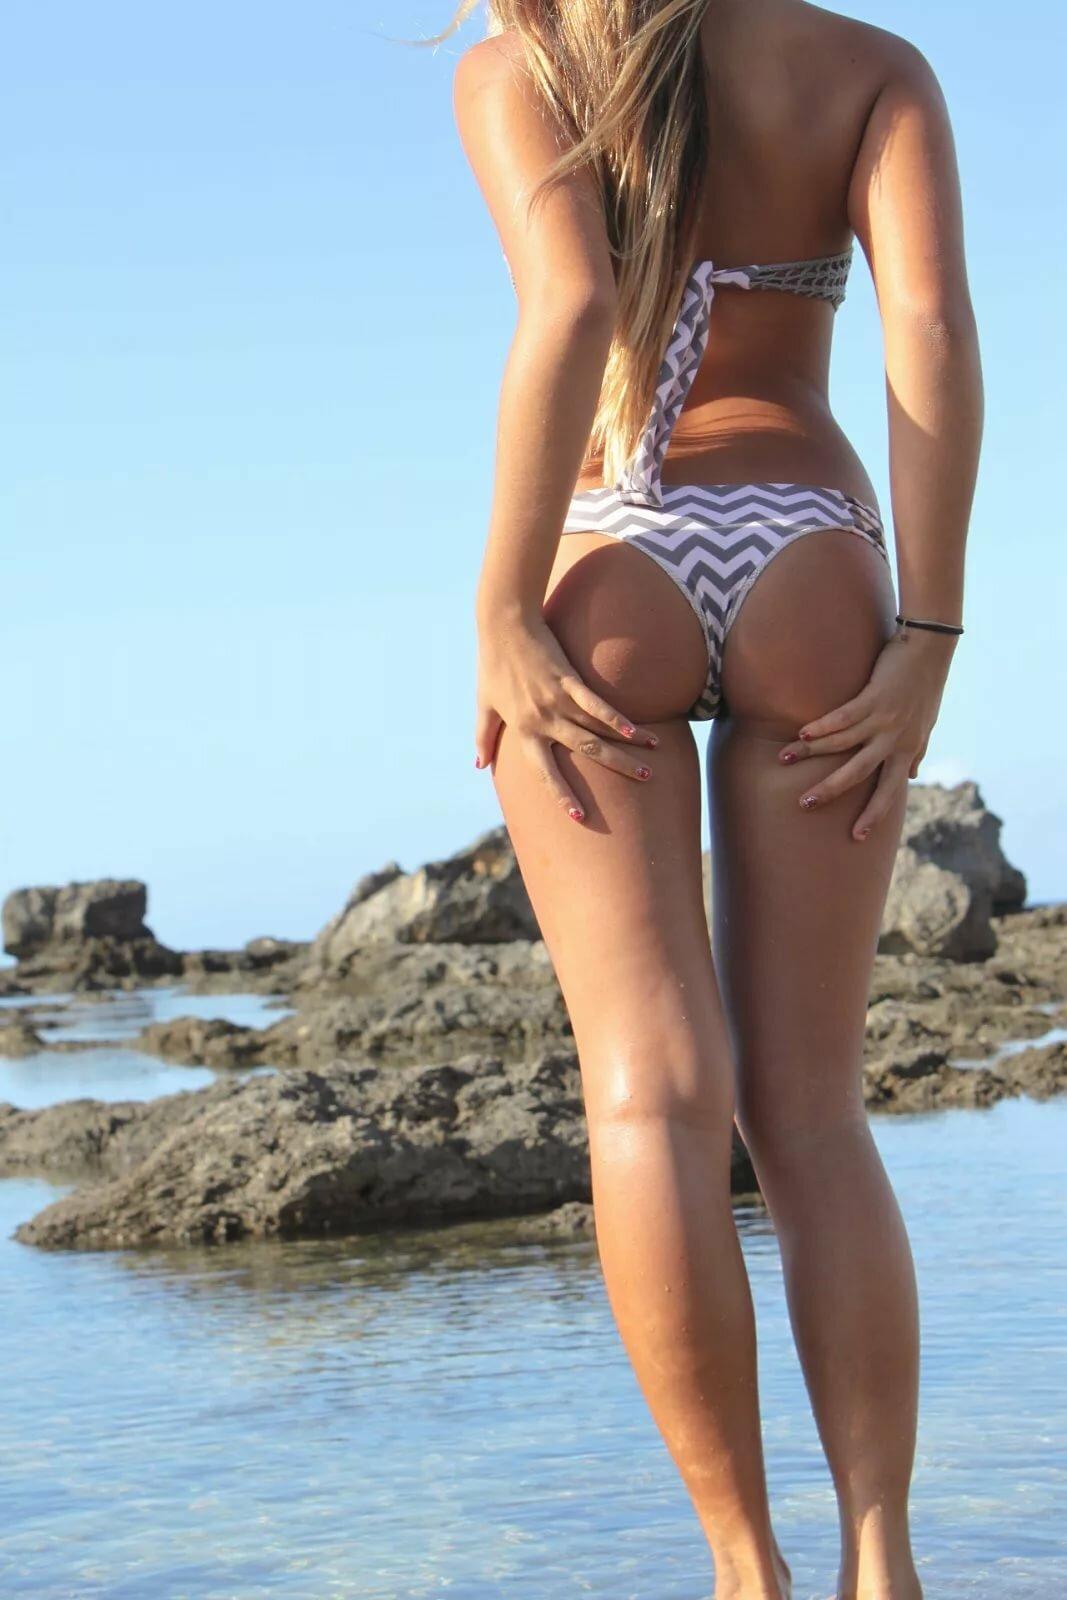 Big butts on skinny girls